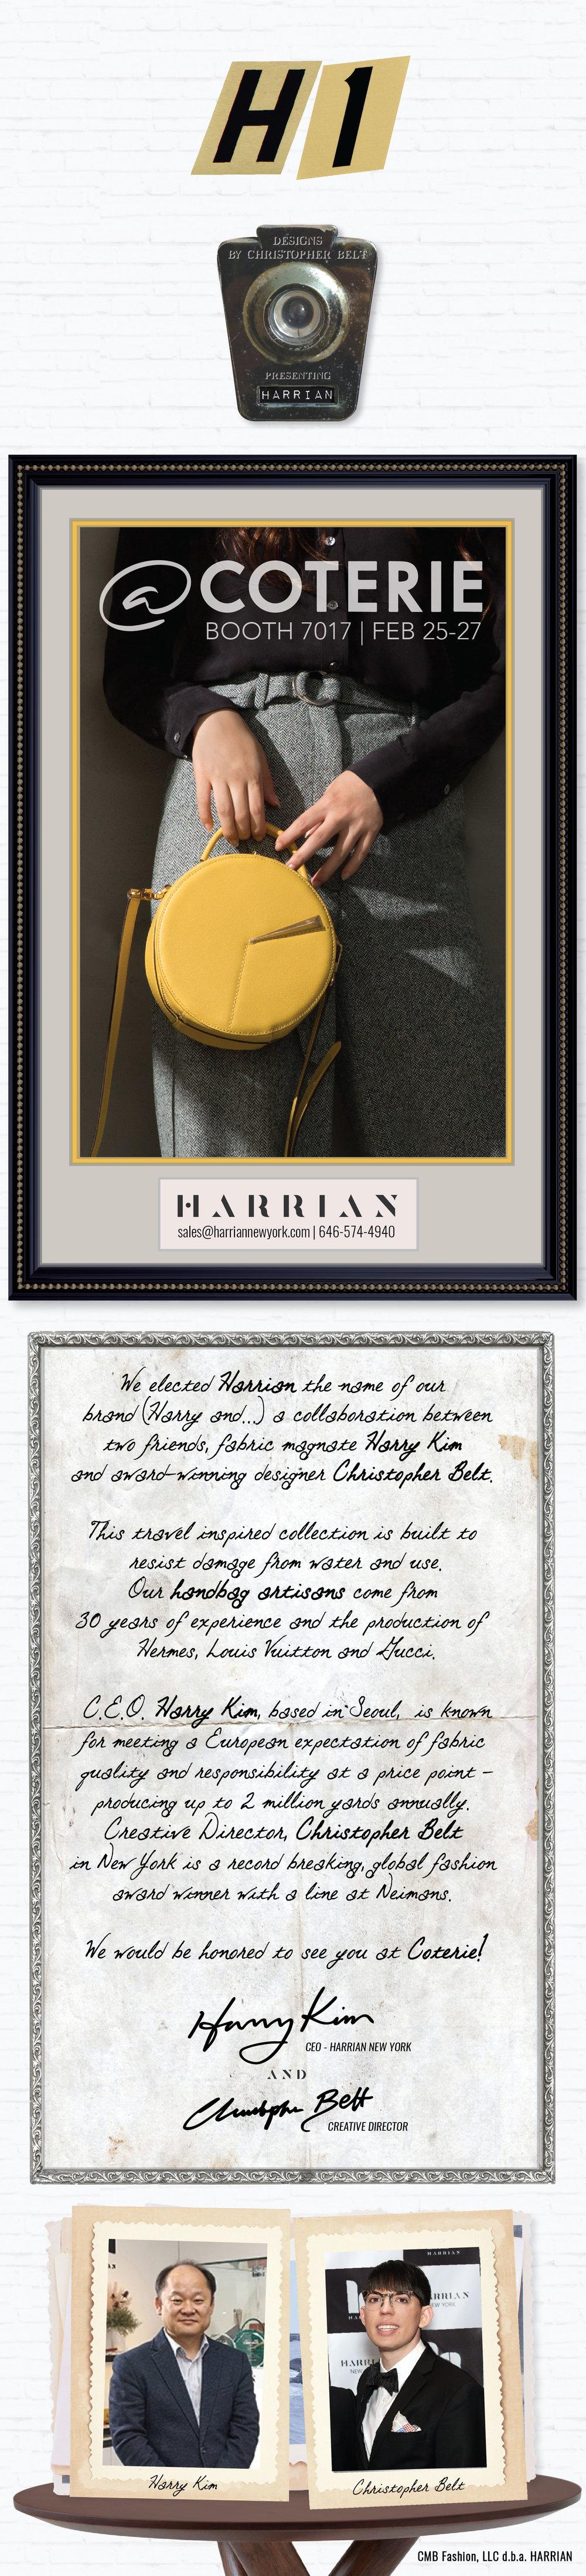 HARRIAN-MARKETING-EMAI-1.29.2019L.jpg